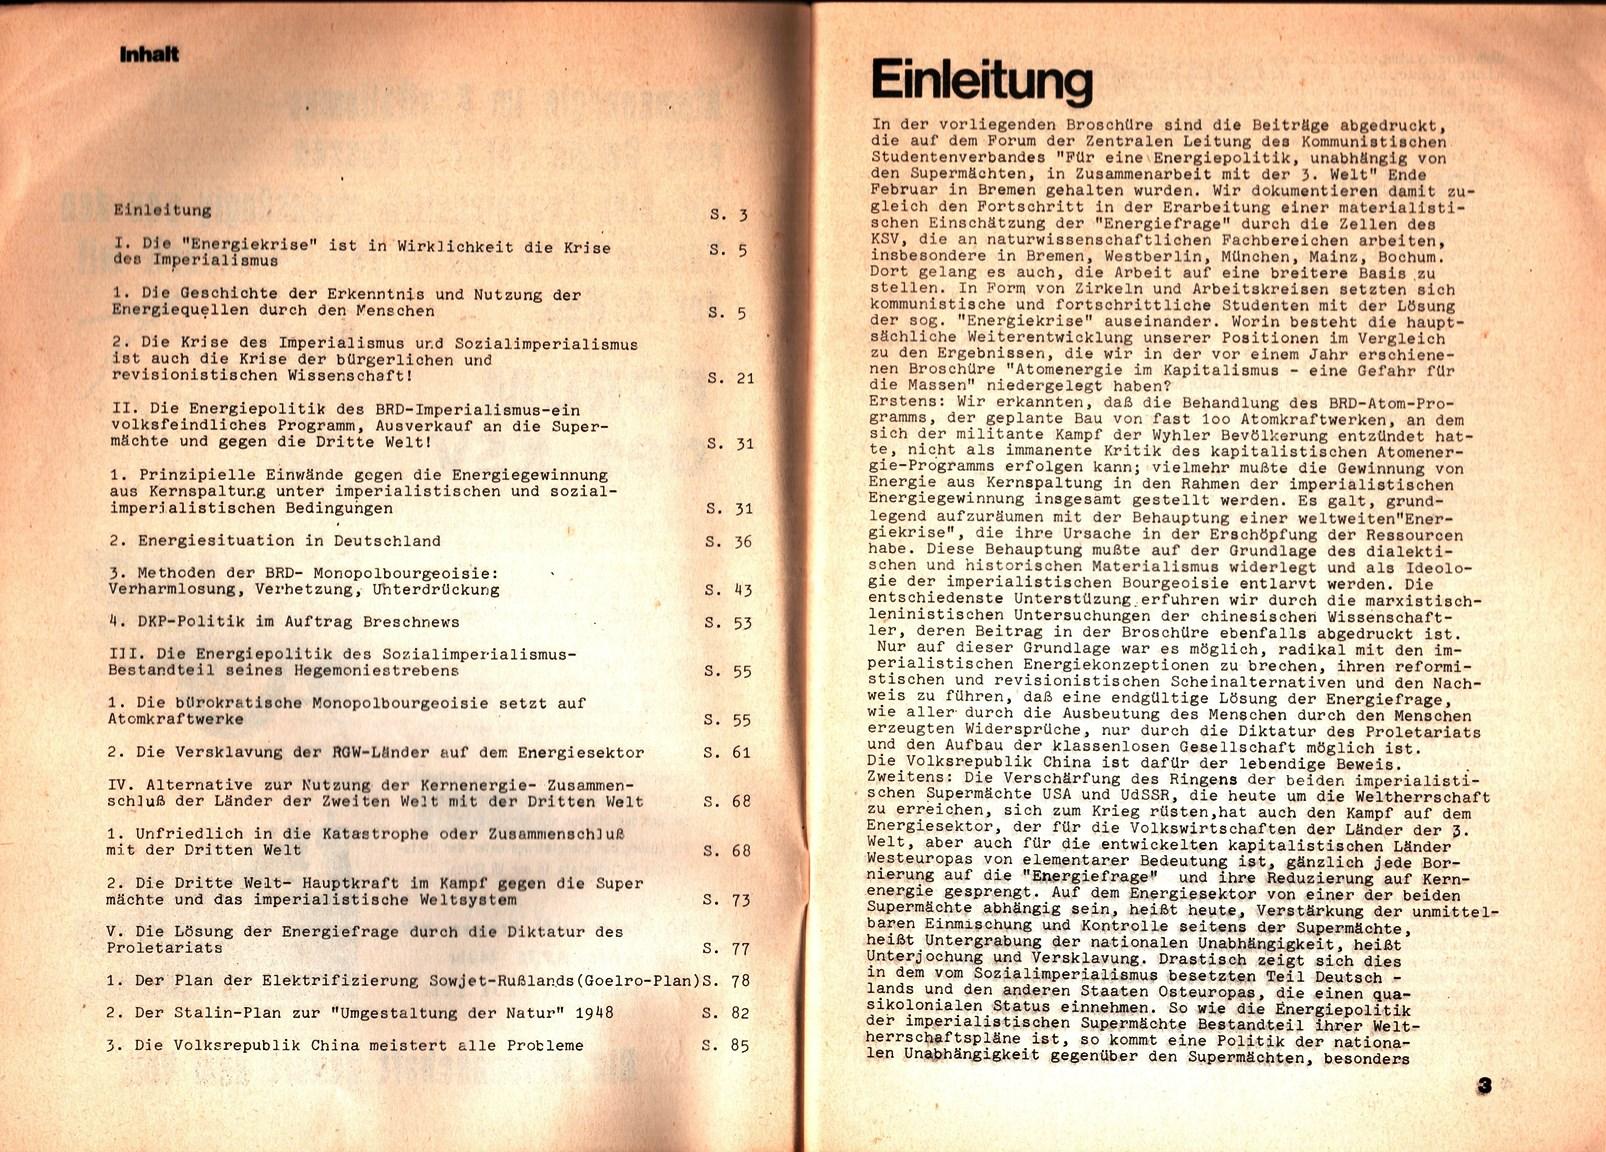 KSV_1976_Atomenergie_im_Kapitalismus_003